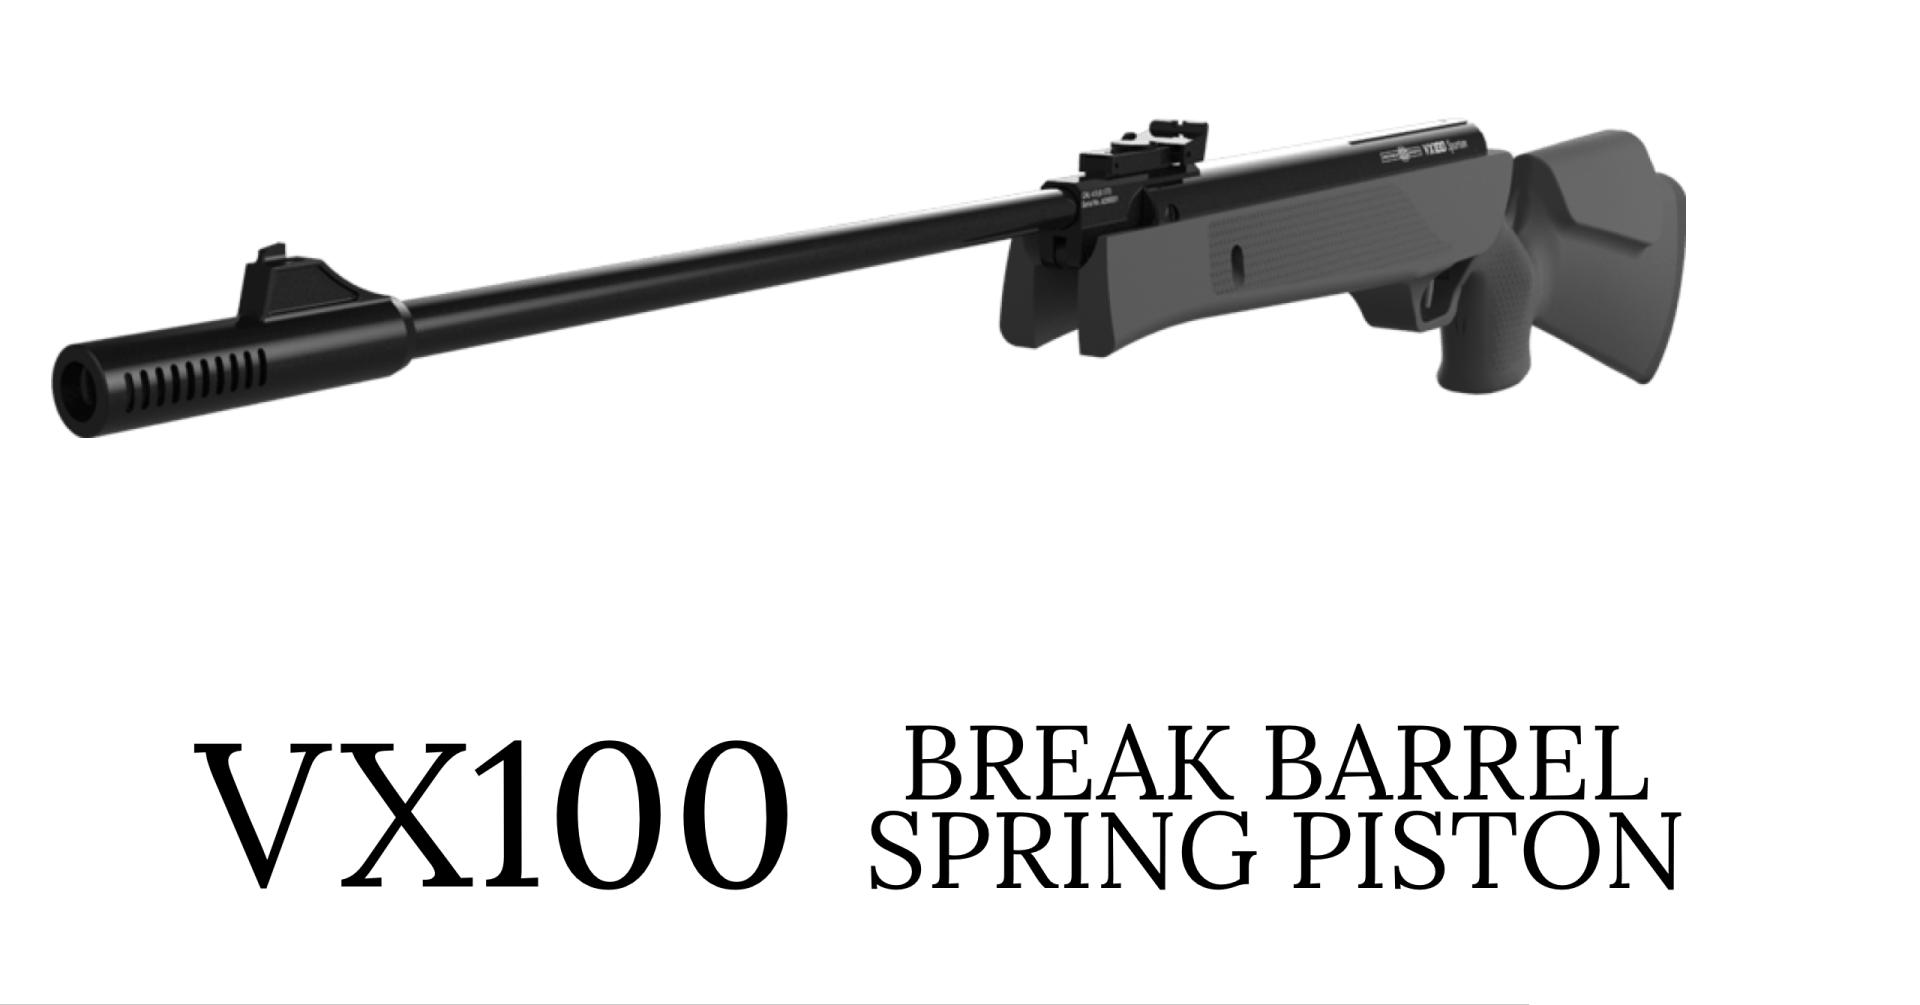 Precihole VX 100 Spartan  177 Air Rifle | Spring Piston Break Barrel